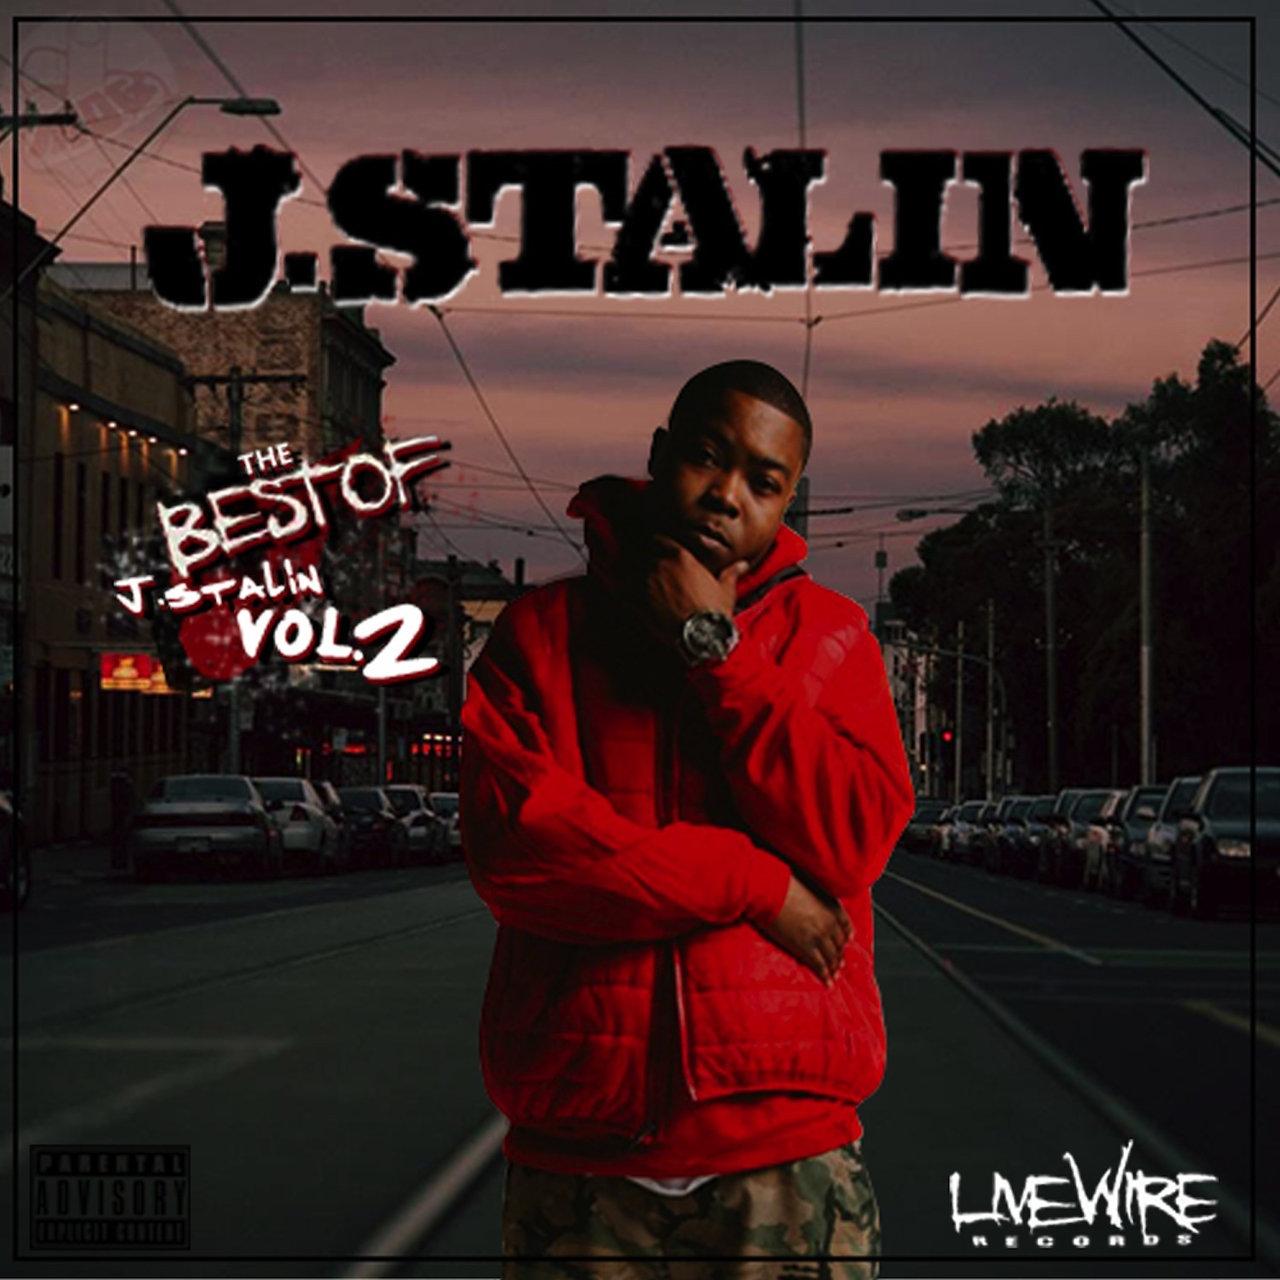 Avatar 2 J Stalin: TIDAL: Listen To The Best Of J. Stalin Vol. 2 On TIDAL